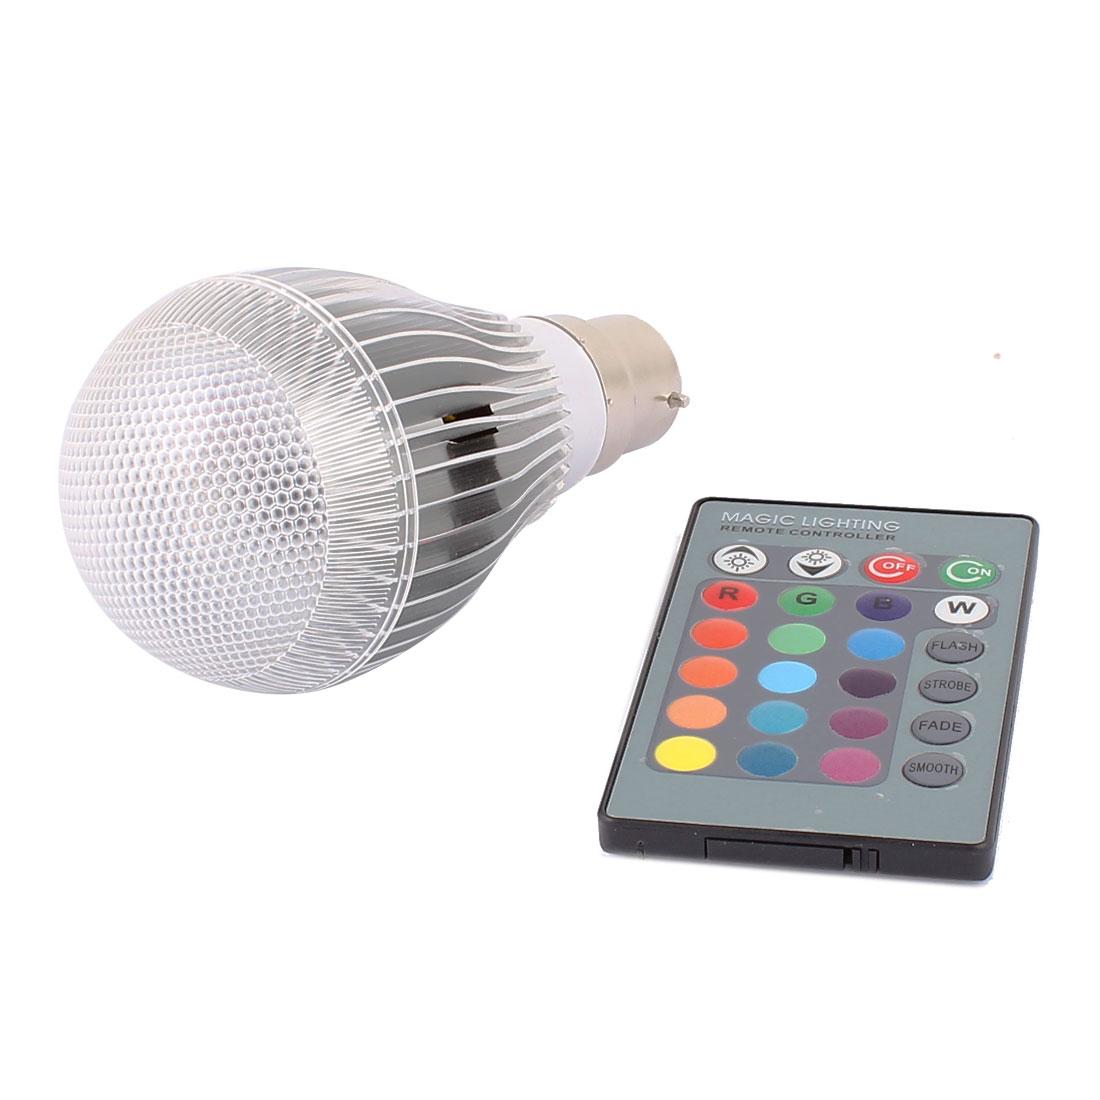 B22 16 Colors Change Ball Light RGB LED Lamp Bulb 5W AC 85V-265V w Remote Controller